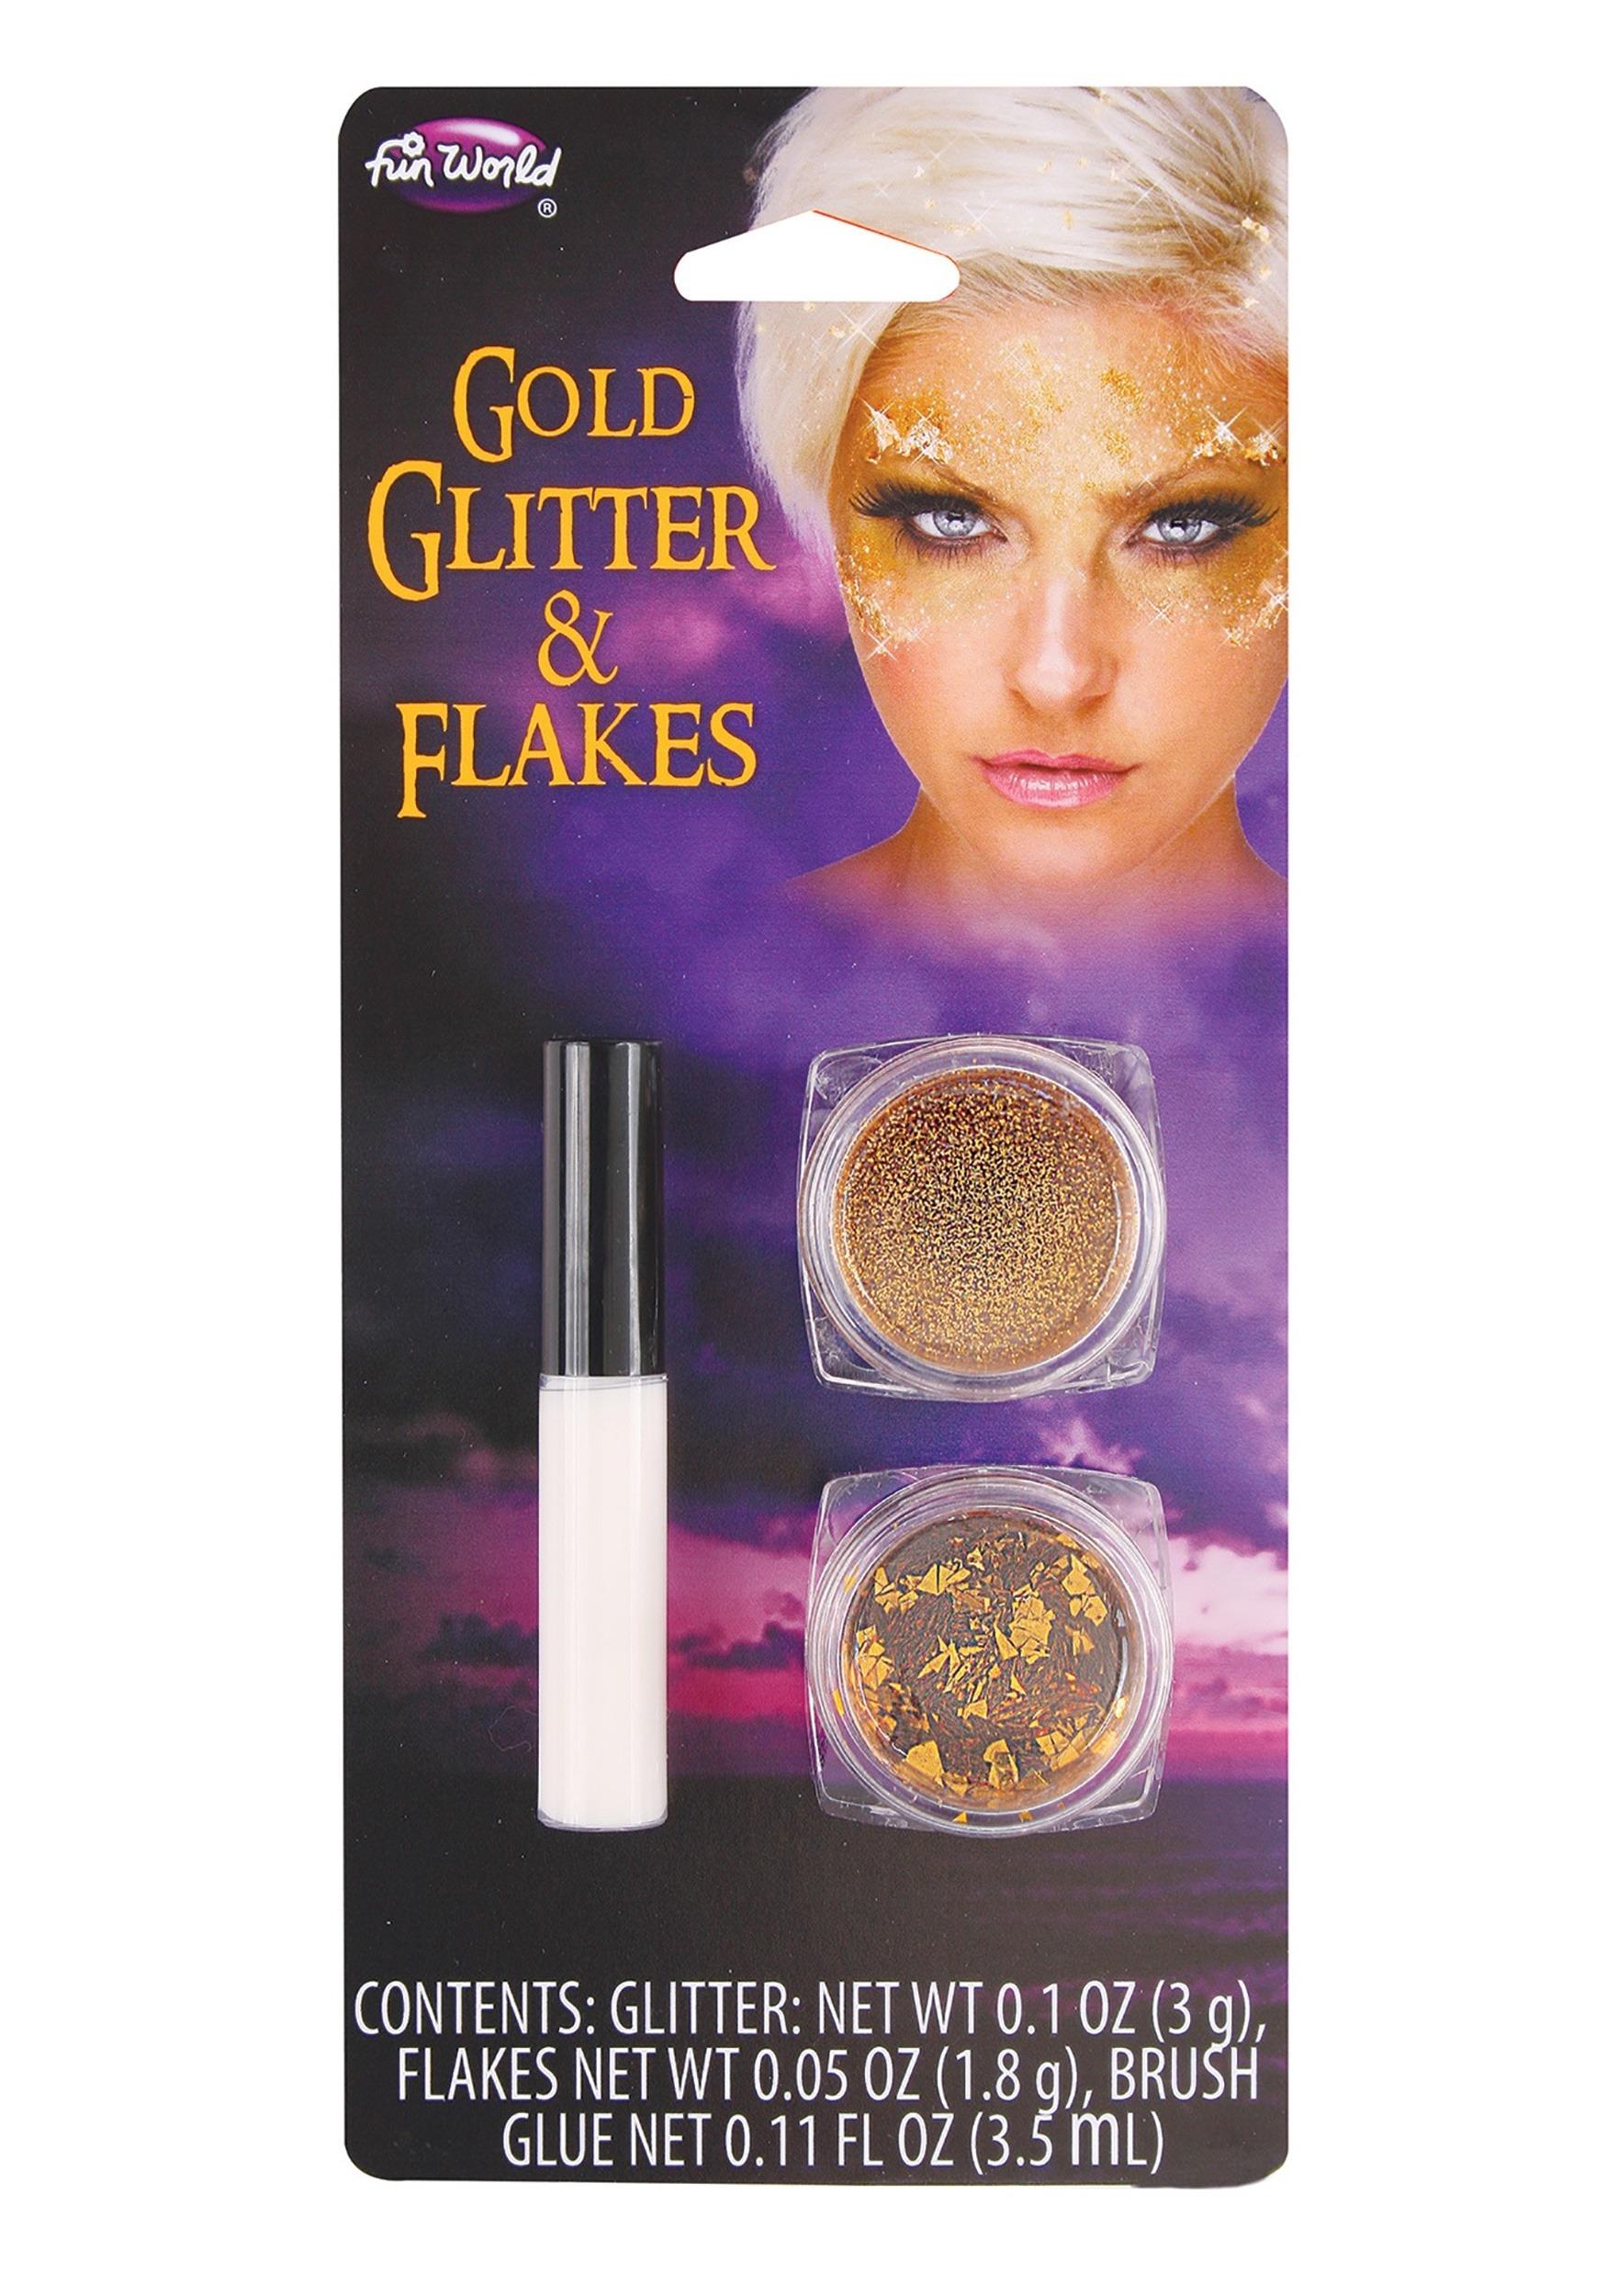 Fun World Gold Glitter and Flakes